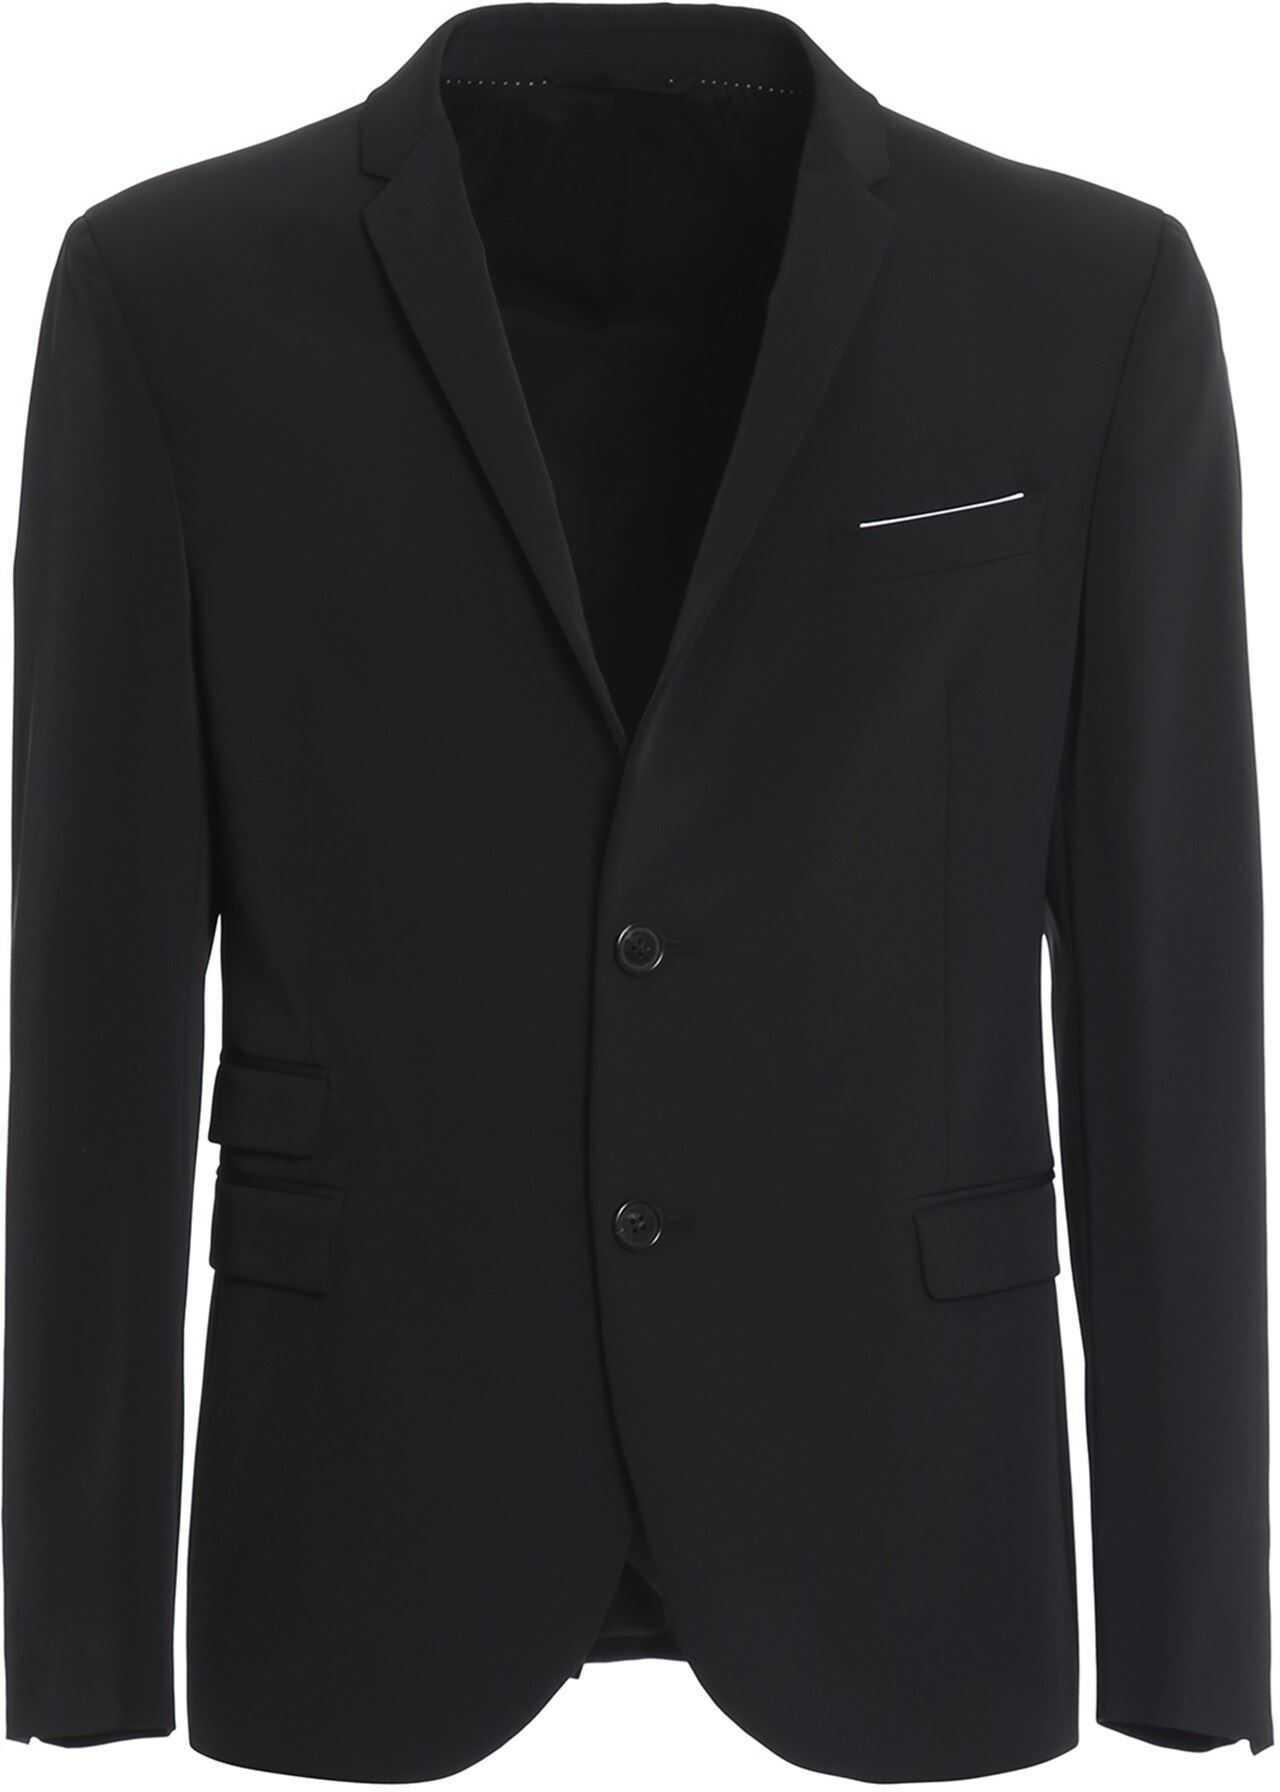 Neil Barrett Stretch Cady Suit In Black Black imagine